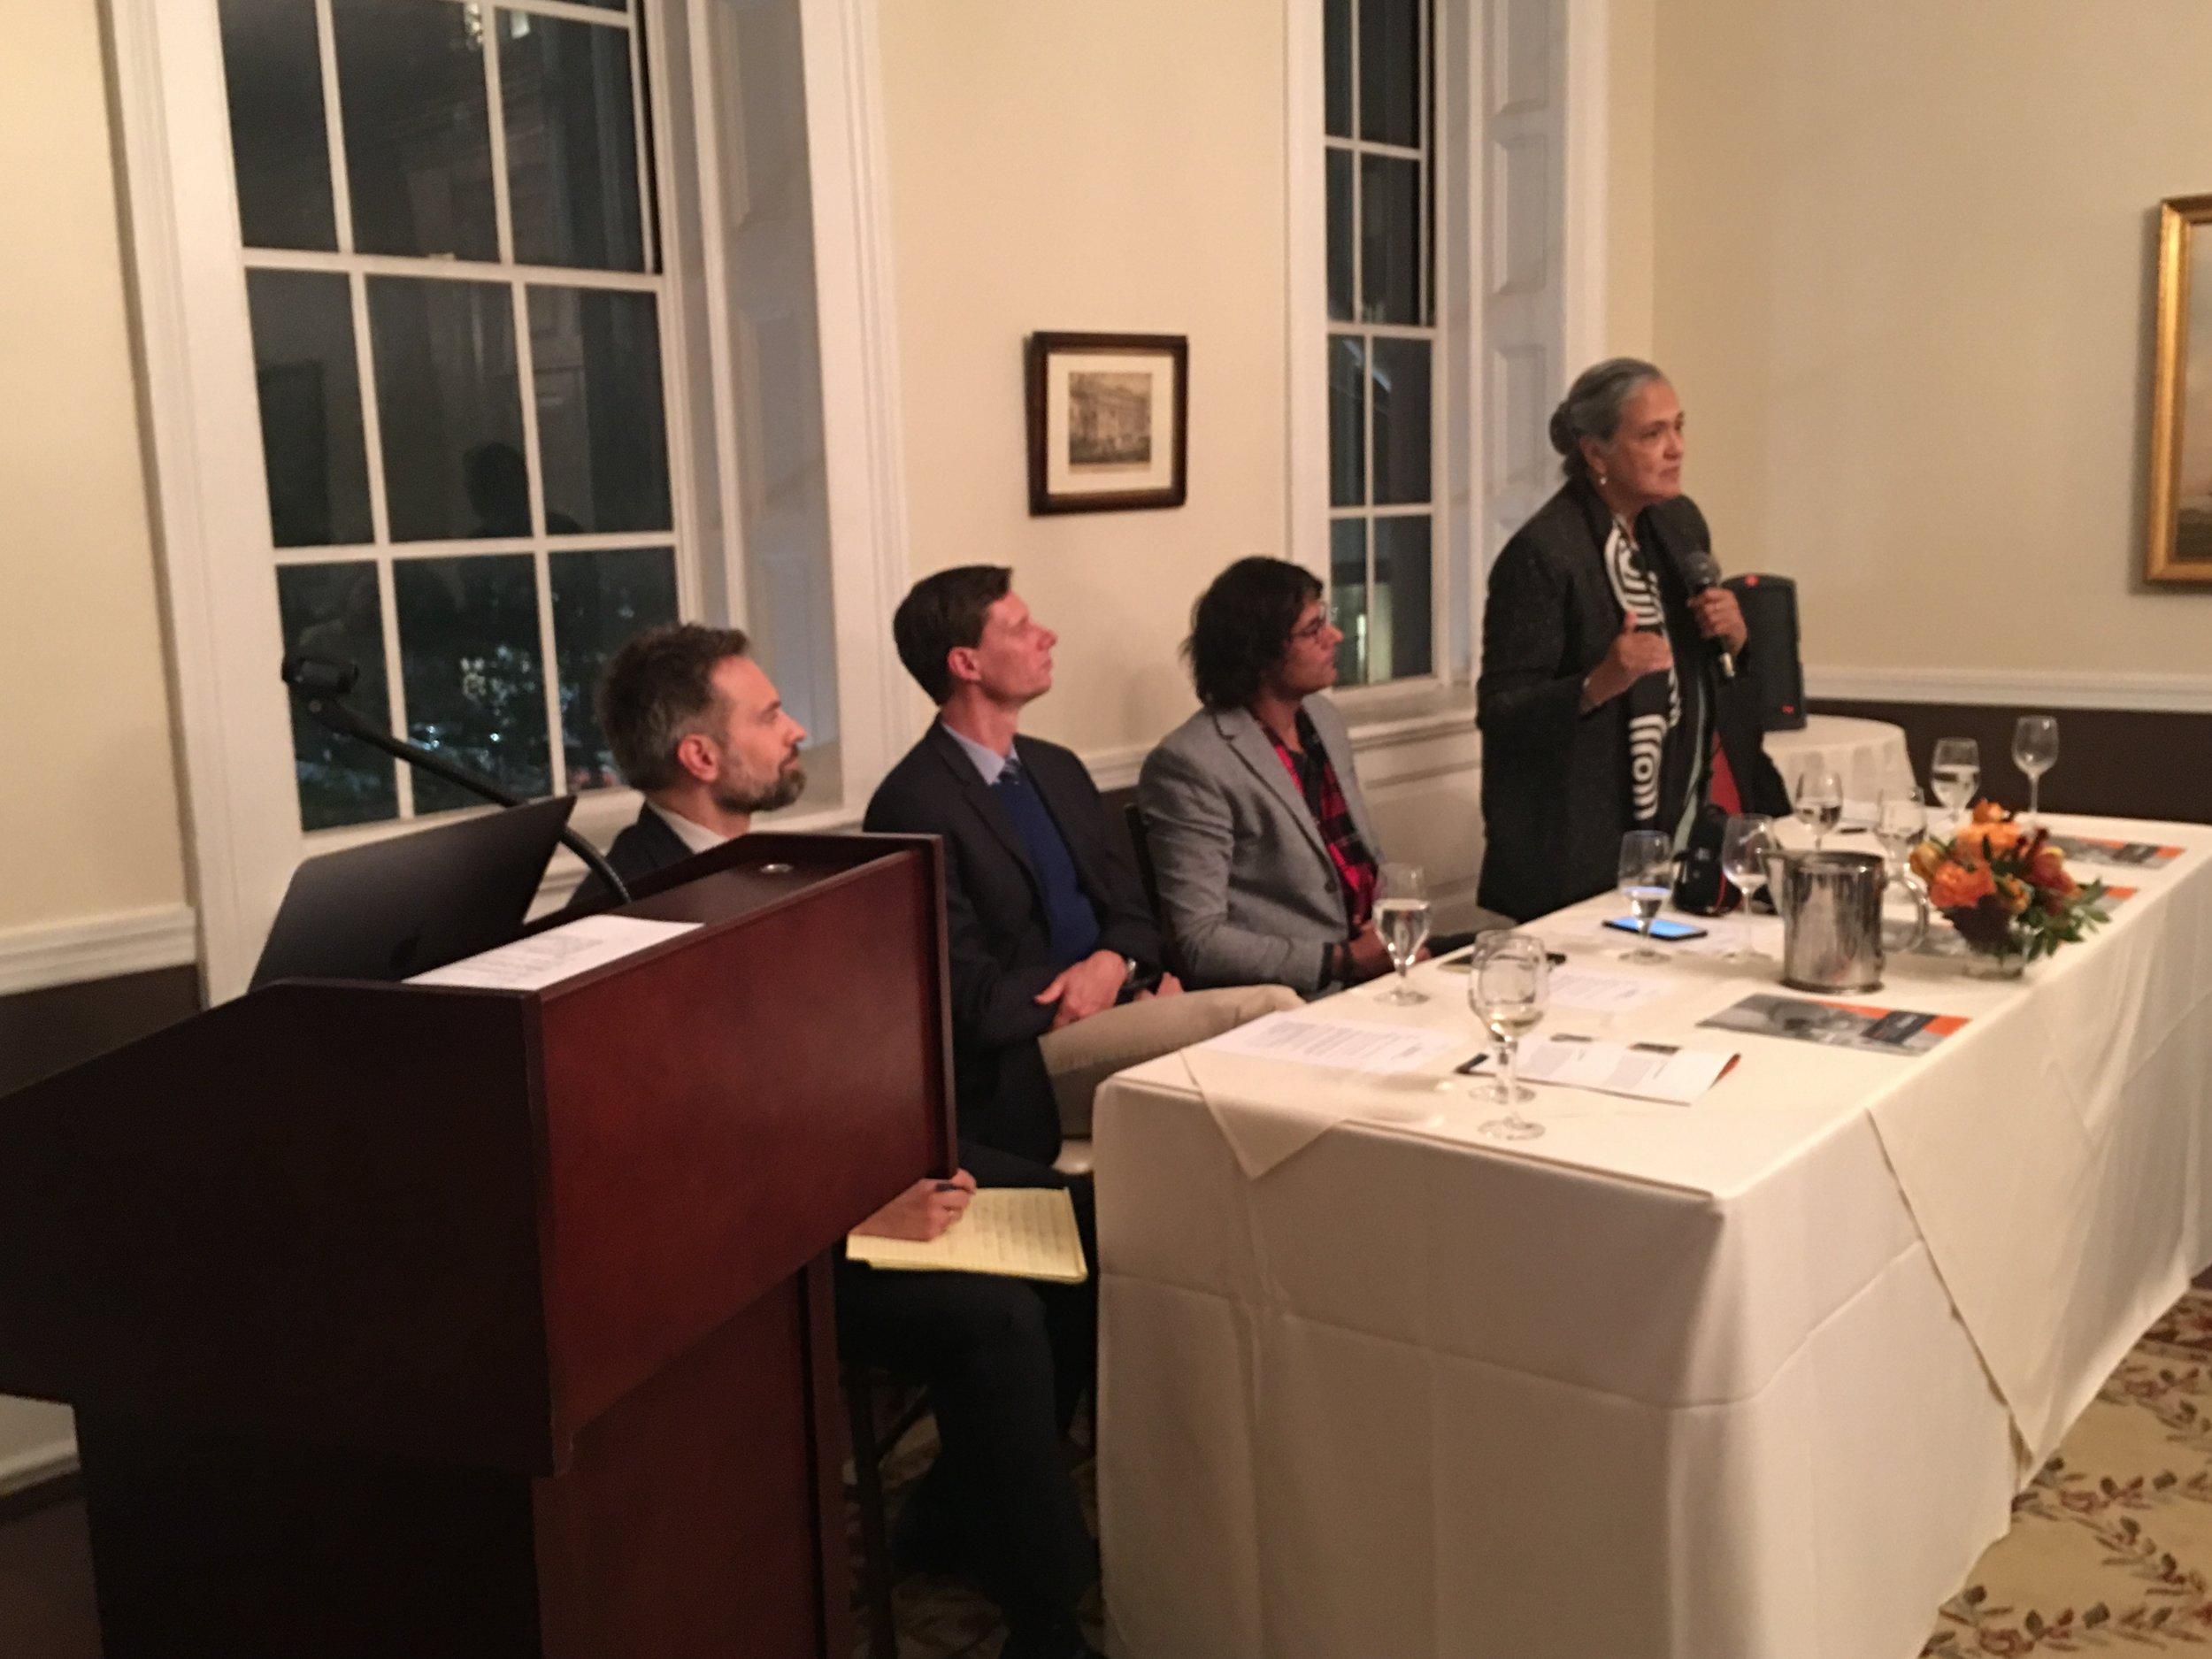 Panelists Paul D. Glader, Markus Spieker, Vishal Arora,Jennifer Arul and Dr. Paul Marshall compare President Donald Trump to India Prime Minister Narendra Modi.